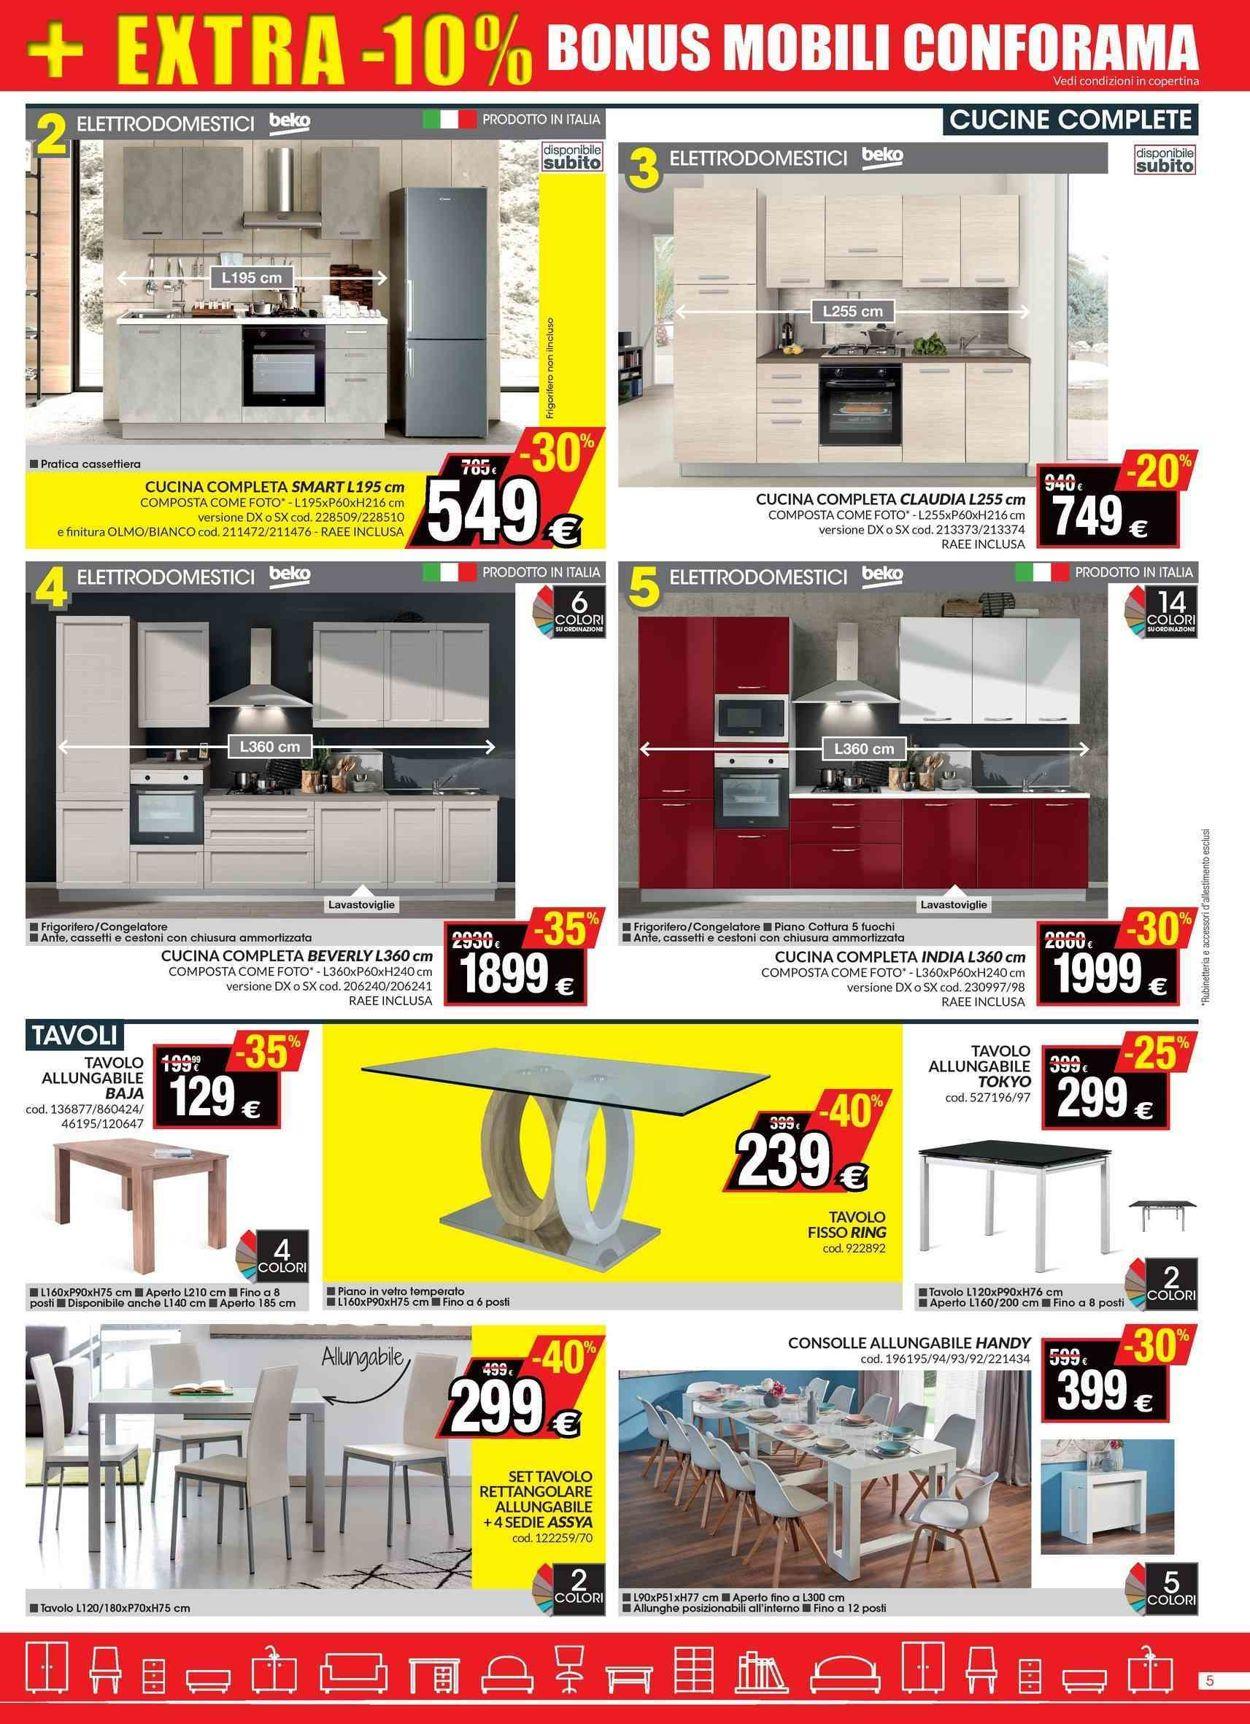 Volantino Conforama - Offerte 20/06-05/07/2019 (Pagina 5)